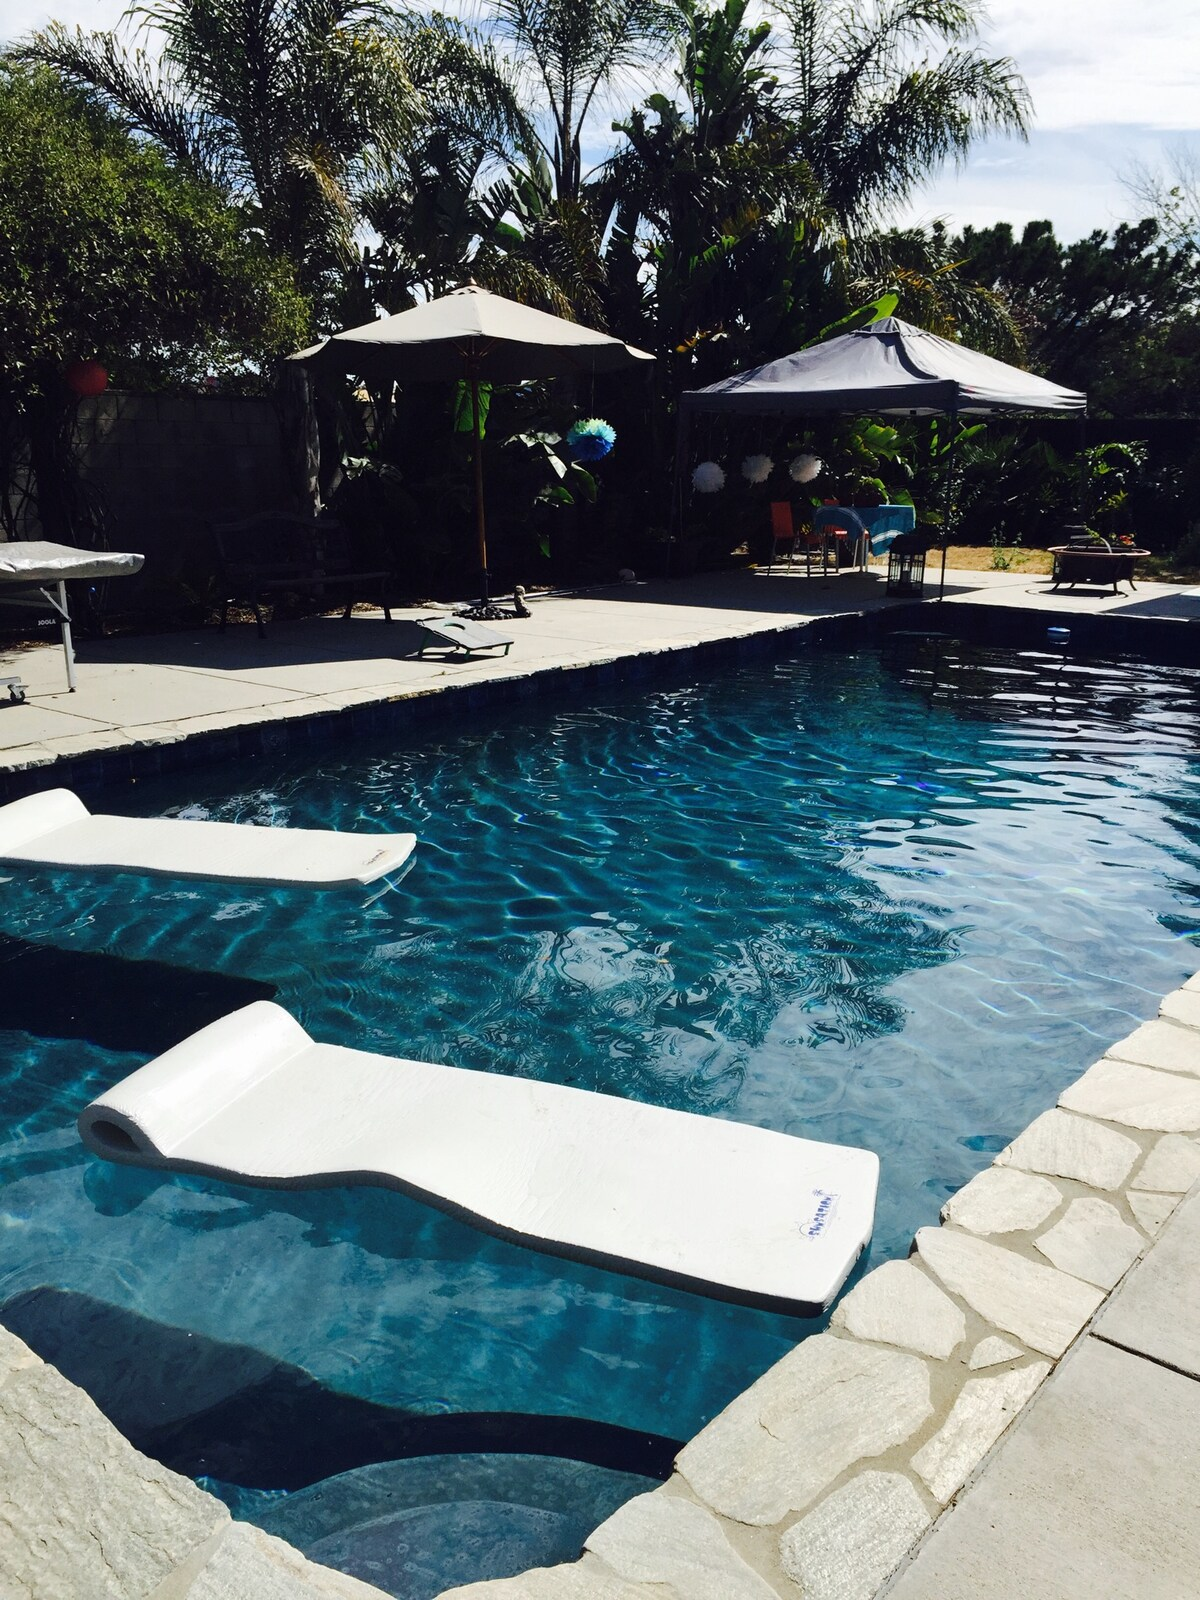 Lux 3-4 Bedrm, Lap Pool, Grt Local